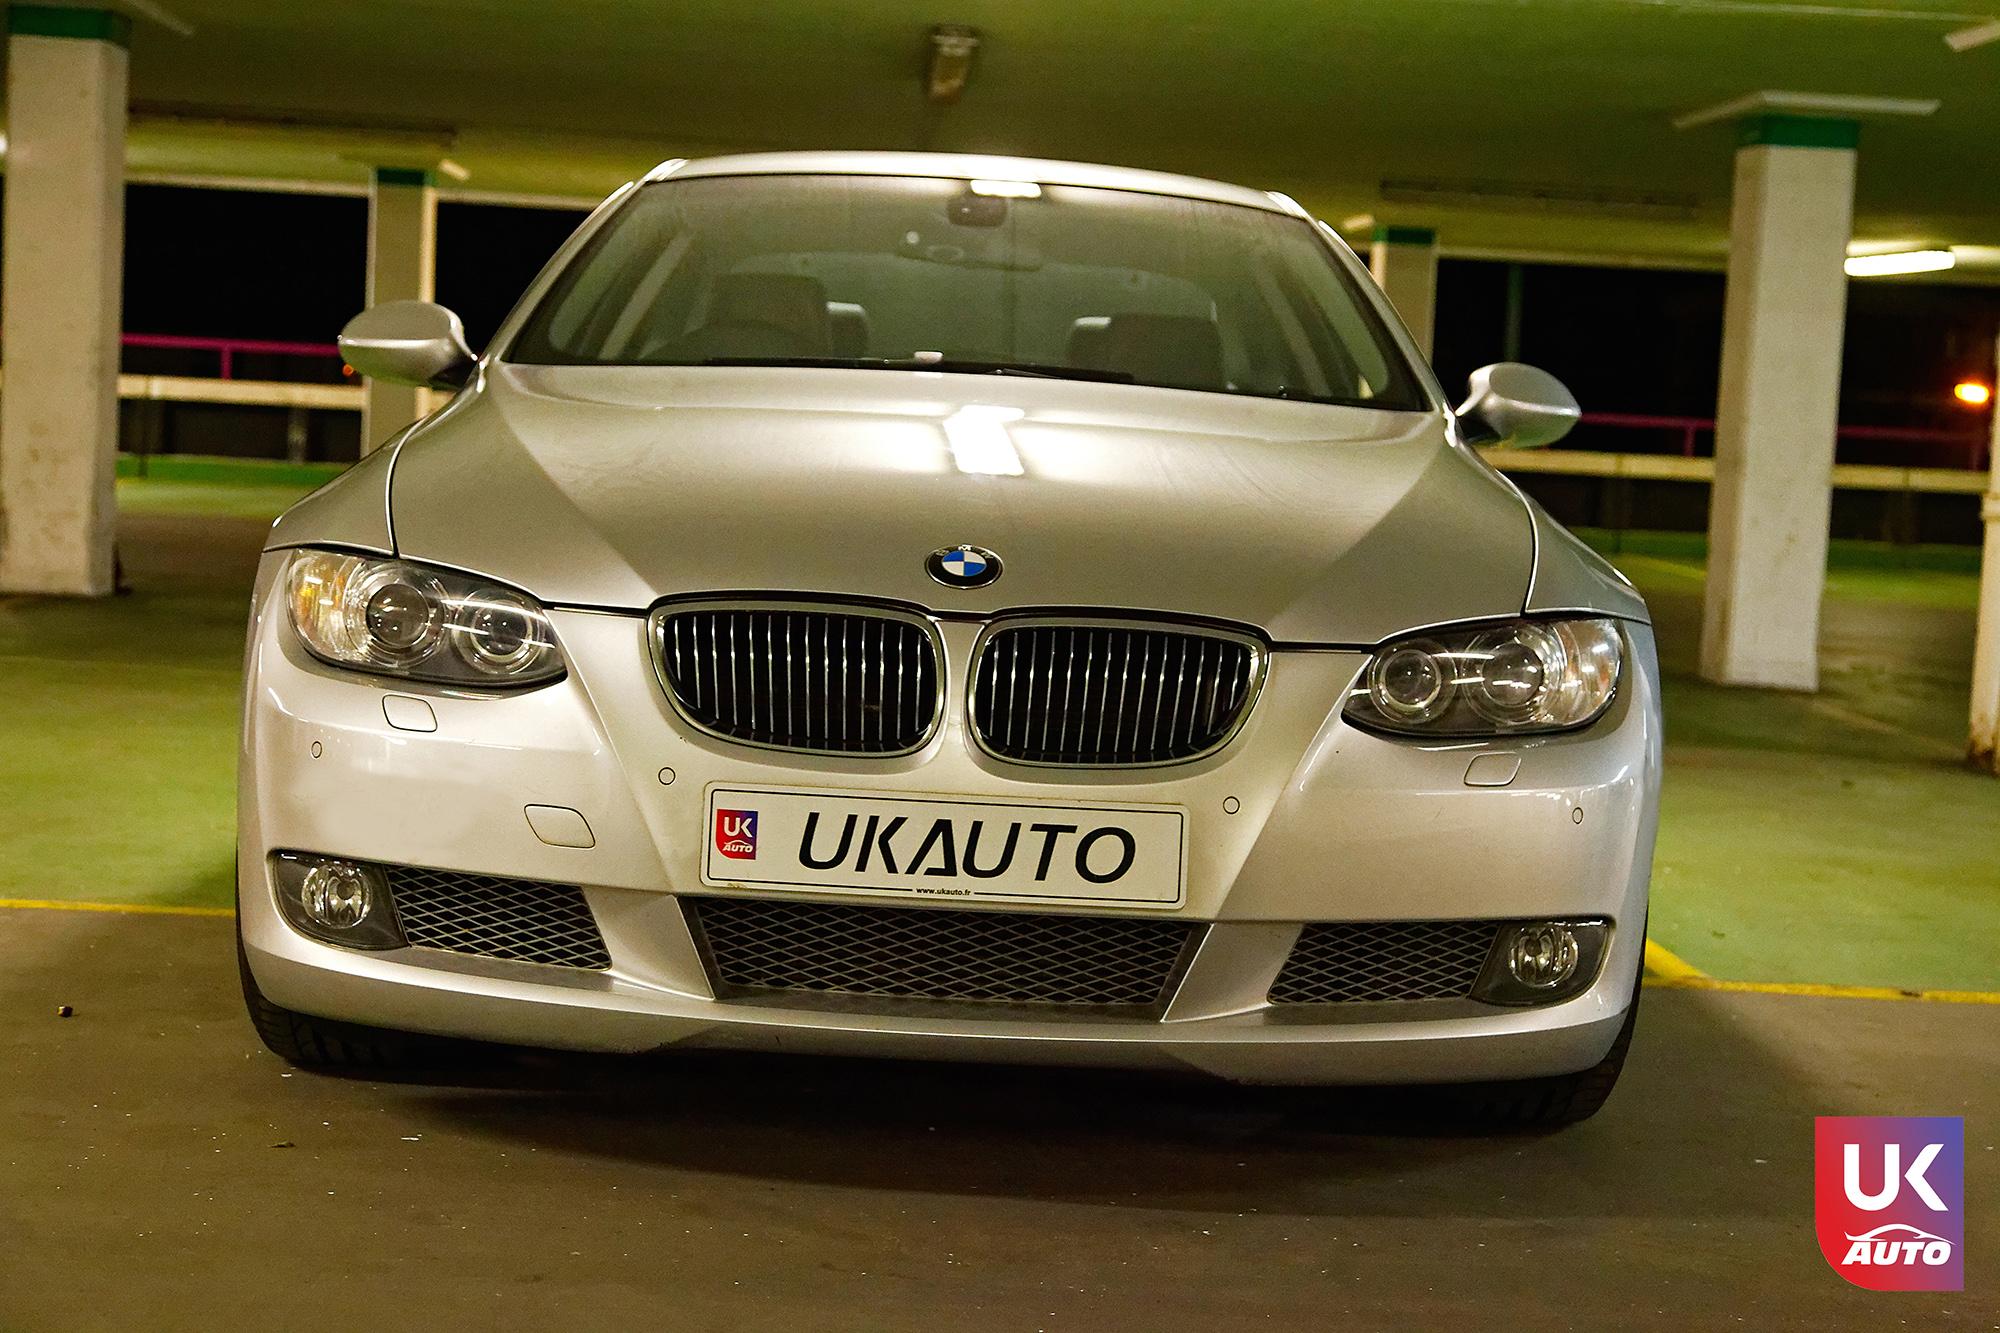 Bmw 335i rhd import uk bmw occasion bmw mandataire e92 rhd coupe uk auto uk ukauto2 - Felecitation a Julien pour cette BMW 335i E92 COUPE RHD importateur voitures anglaises